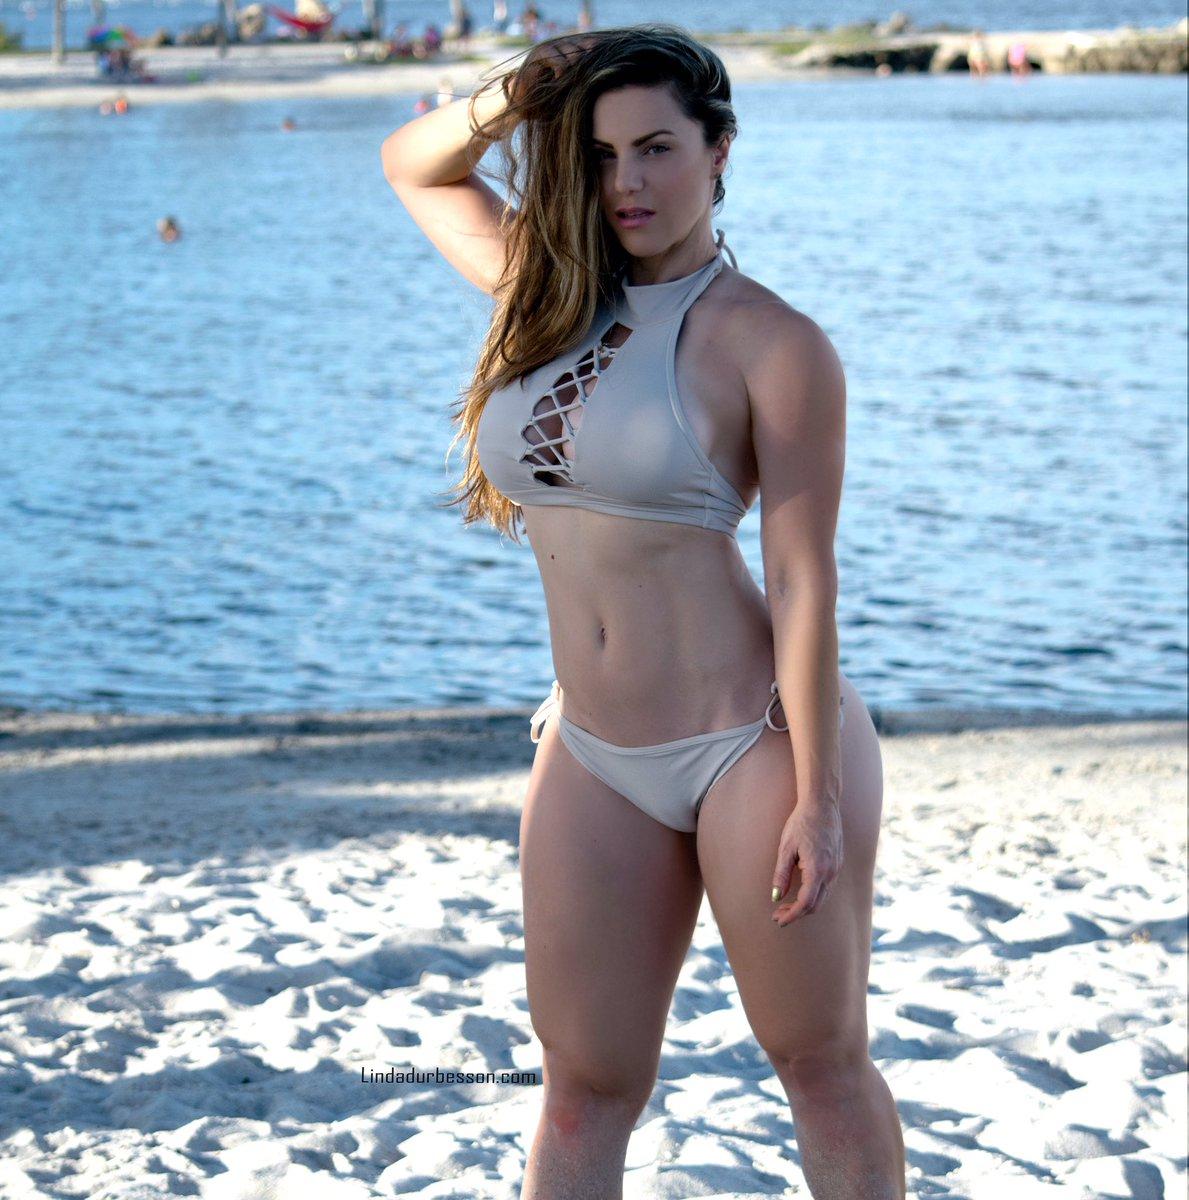 Linda Durbesson nudes (95 pictures) Erotica, iCloud, in bikini